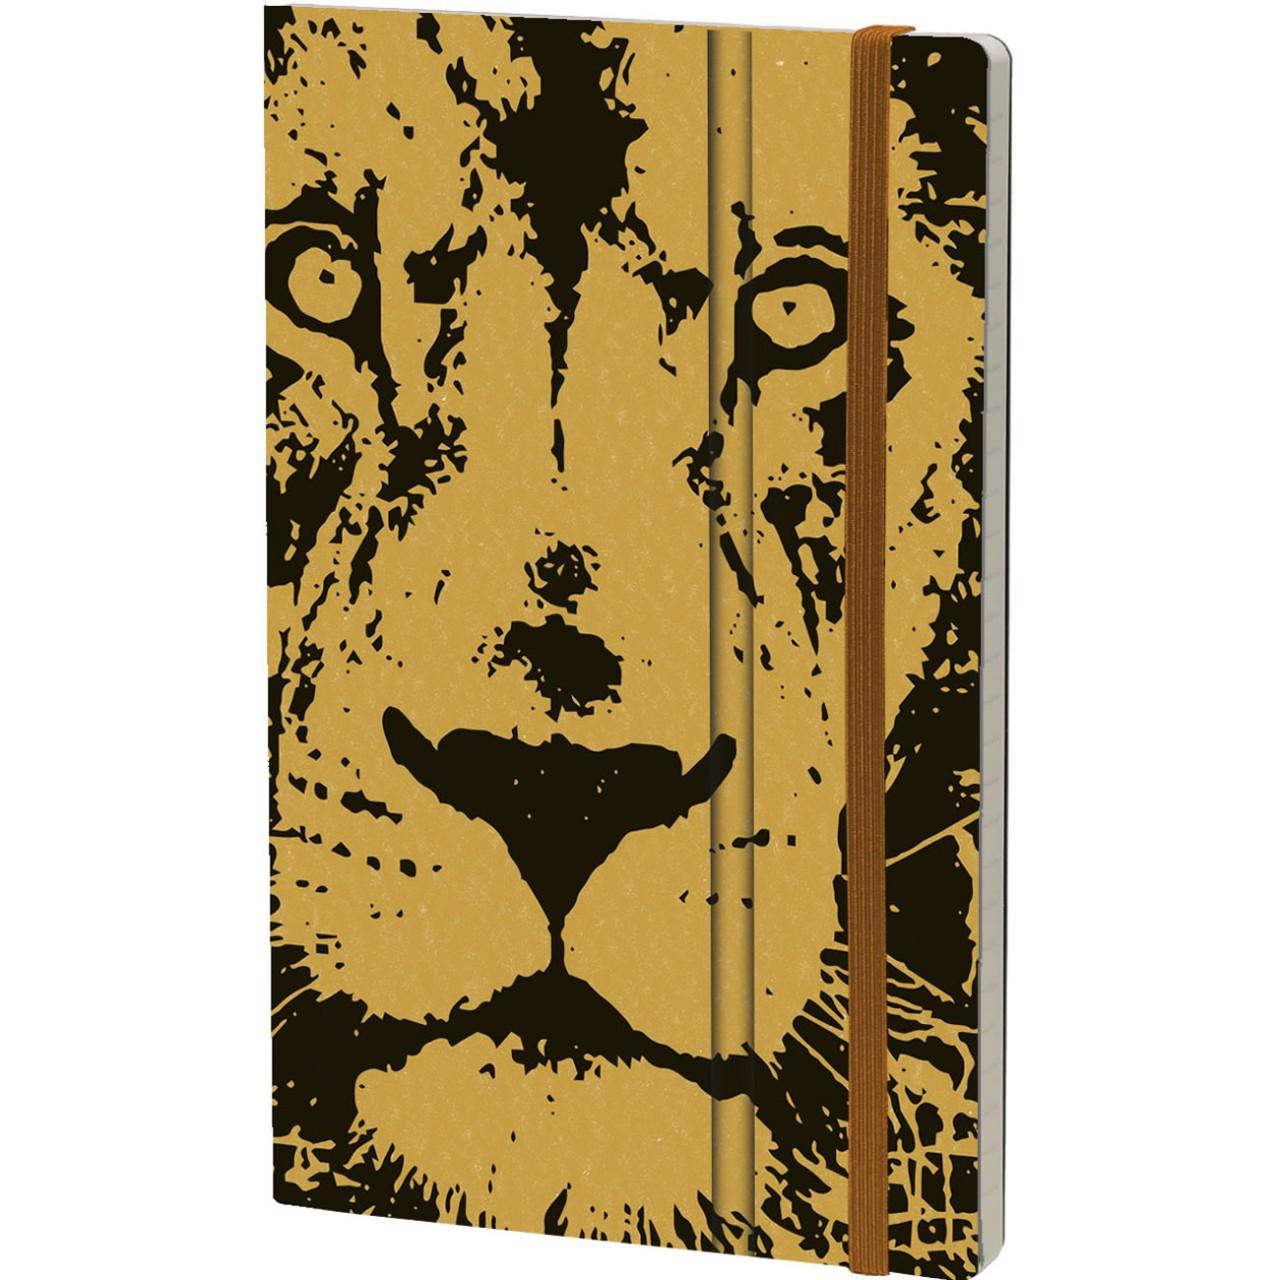 Stifflexible Notizbuch WILD PEARL 13 x 21 cm 192 S., LION